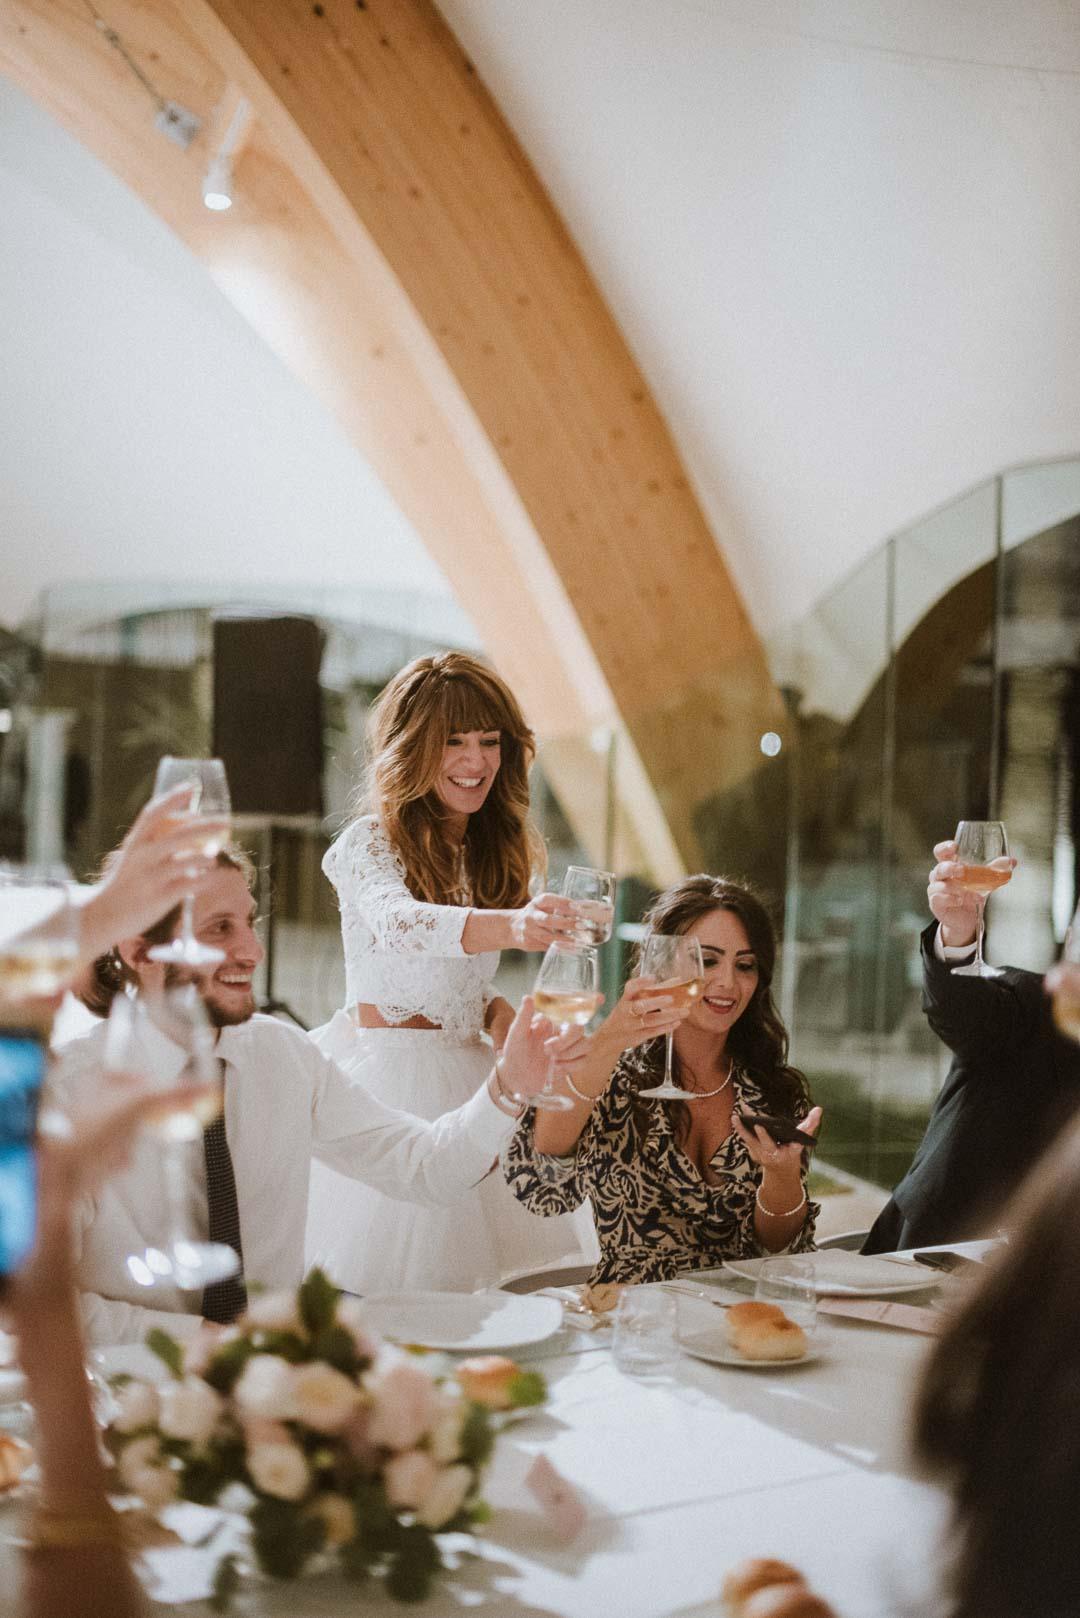 wedding-photographer-destination-fineart-bespoke-reportage-napoli-nabilah-vivianeizzo-spazio46-179